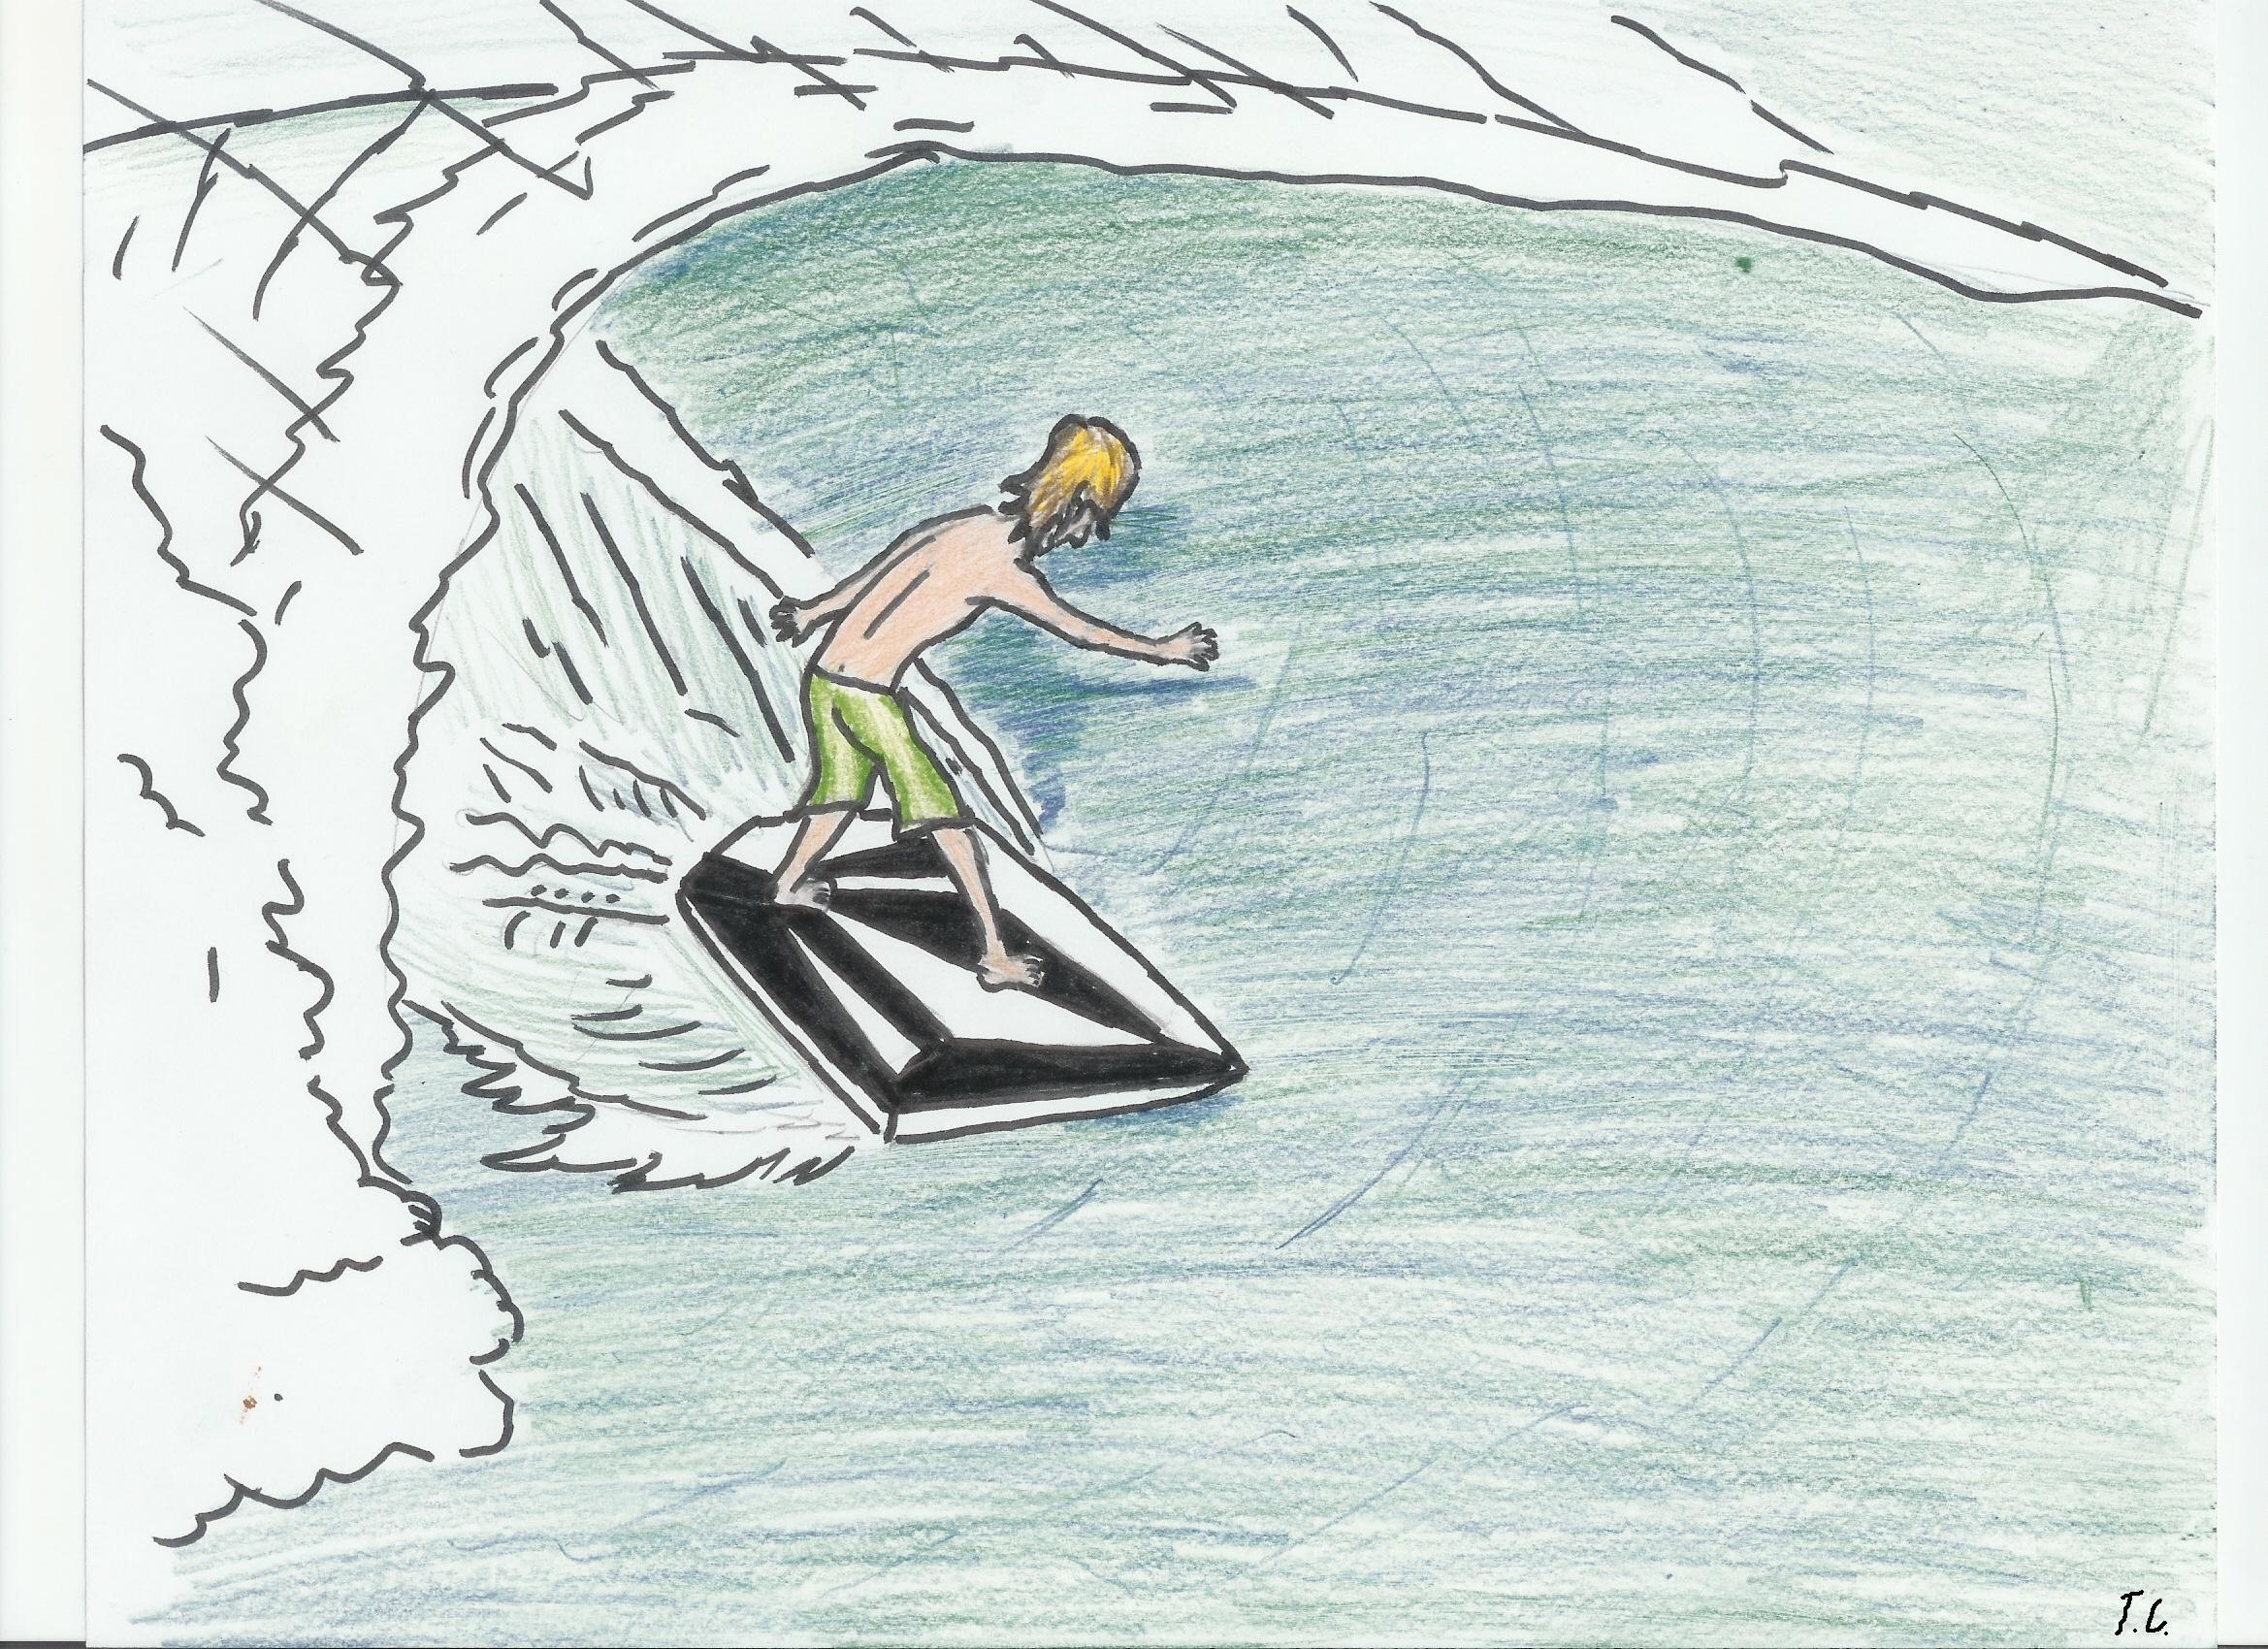 For Volcom by SurfArtist on DeviantArt